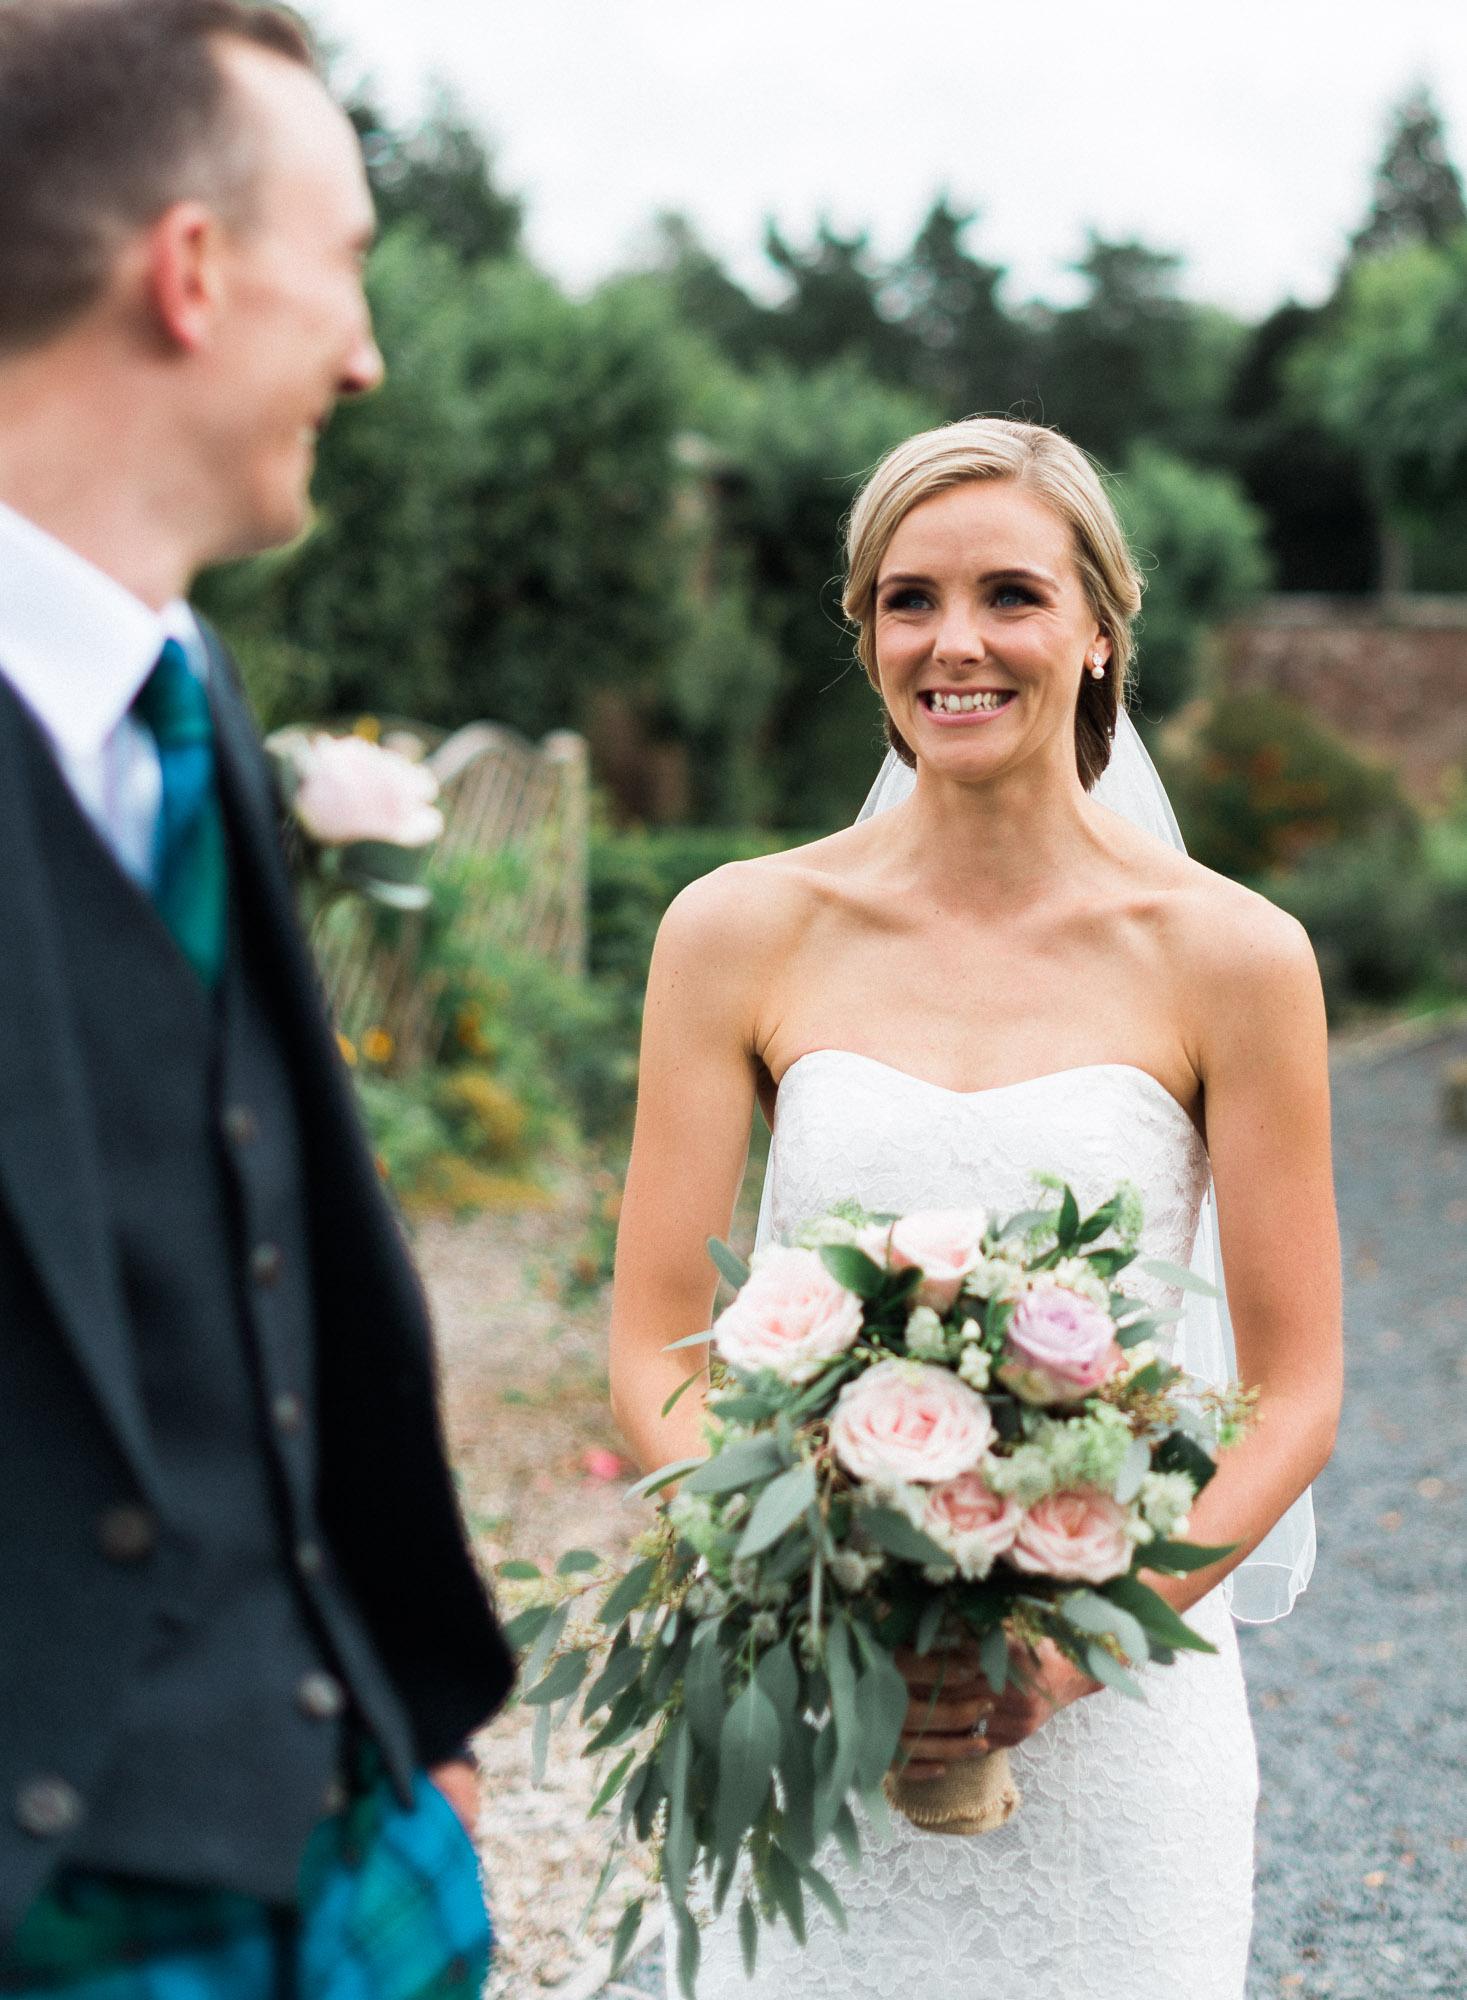 scottish_wedding_blairquhan_castle-43.jpg